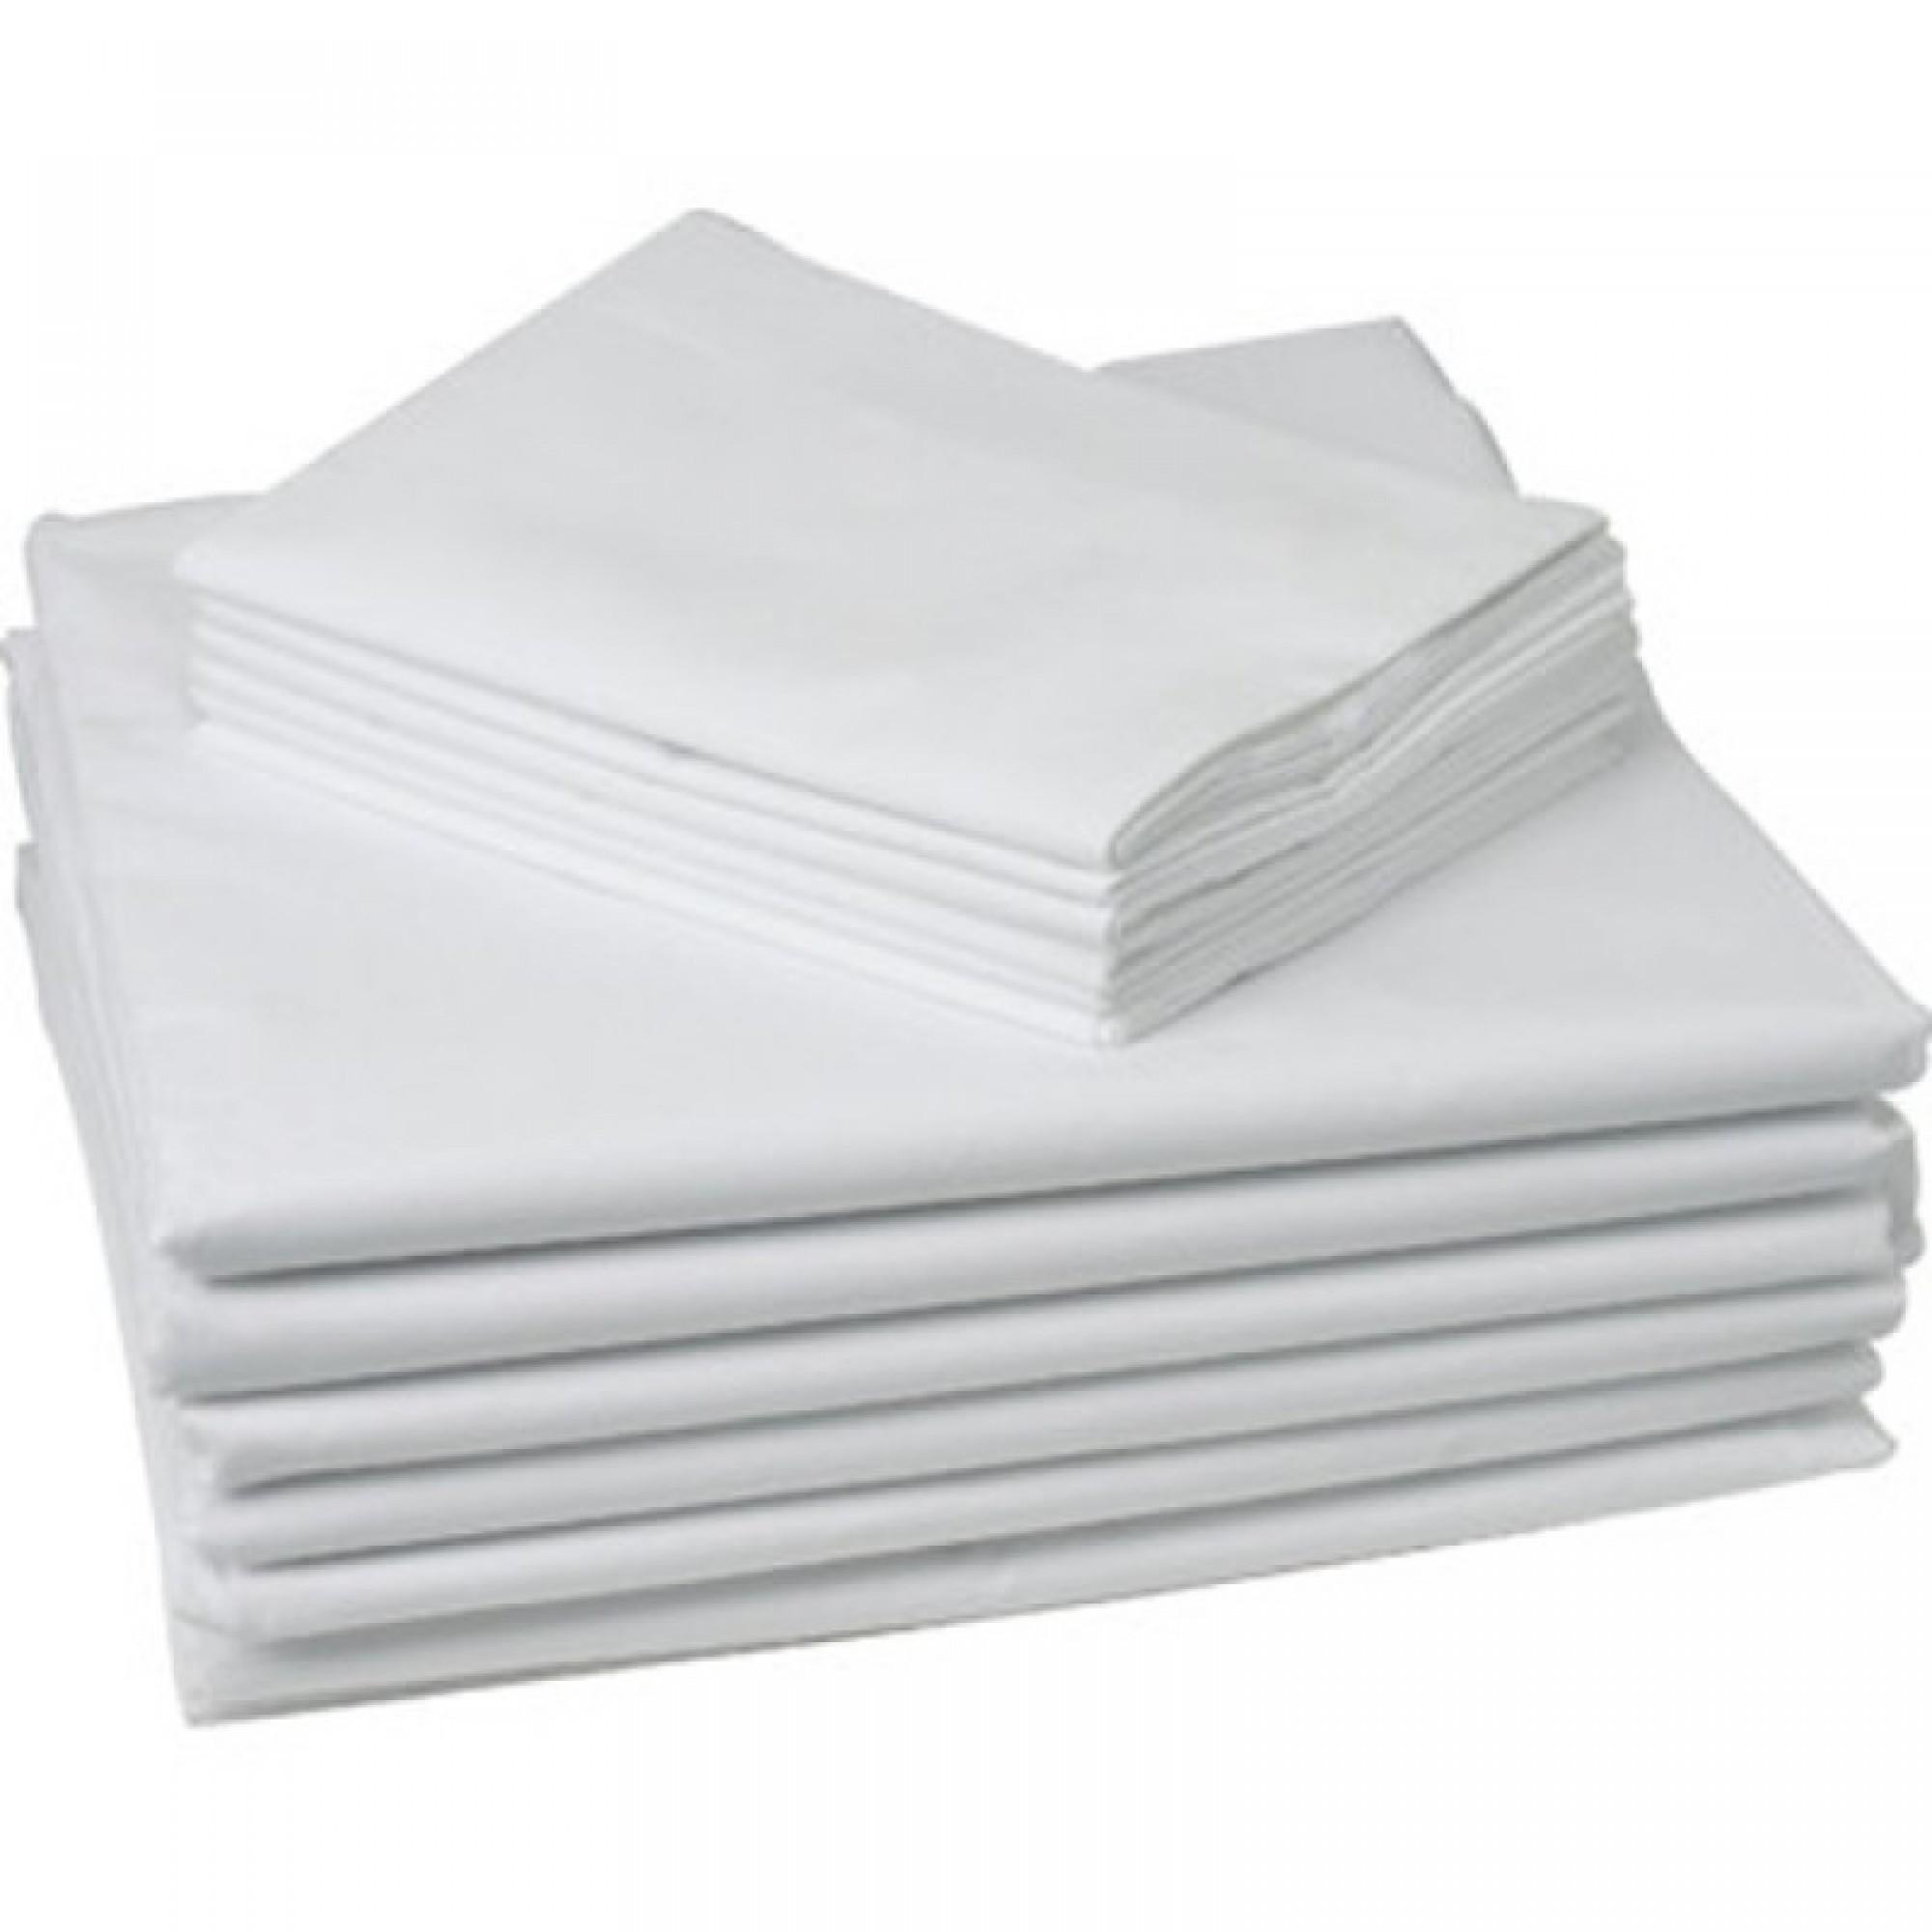 "Калъфка за възглавница Ранфорс ""White"" – 100% Памук"